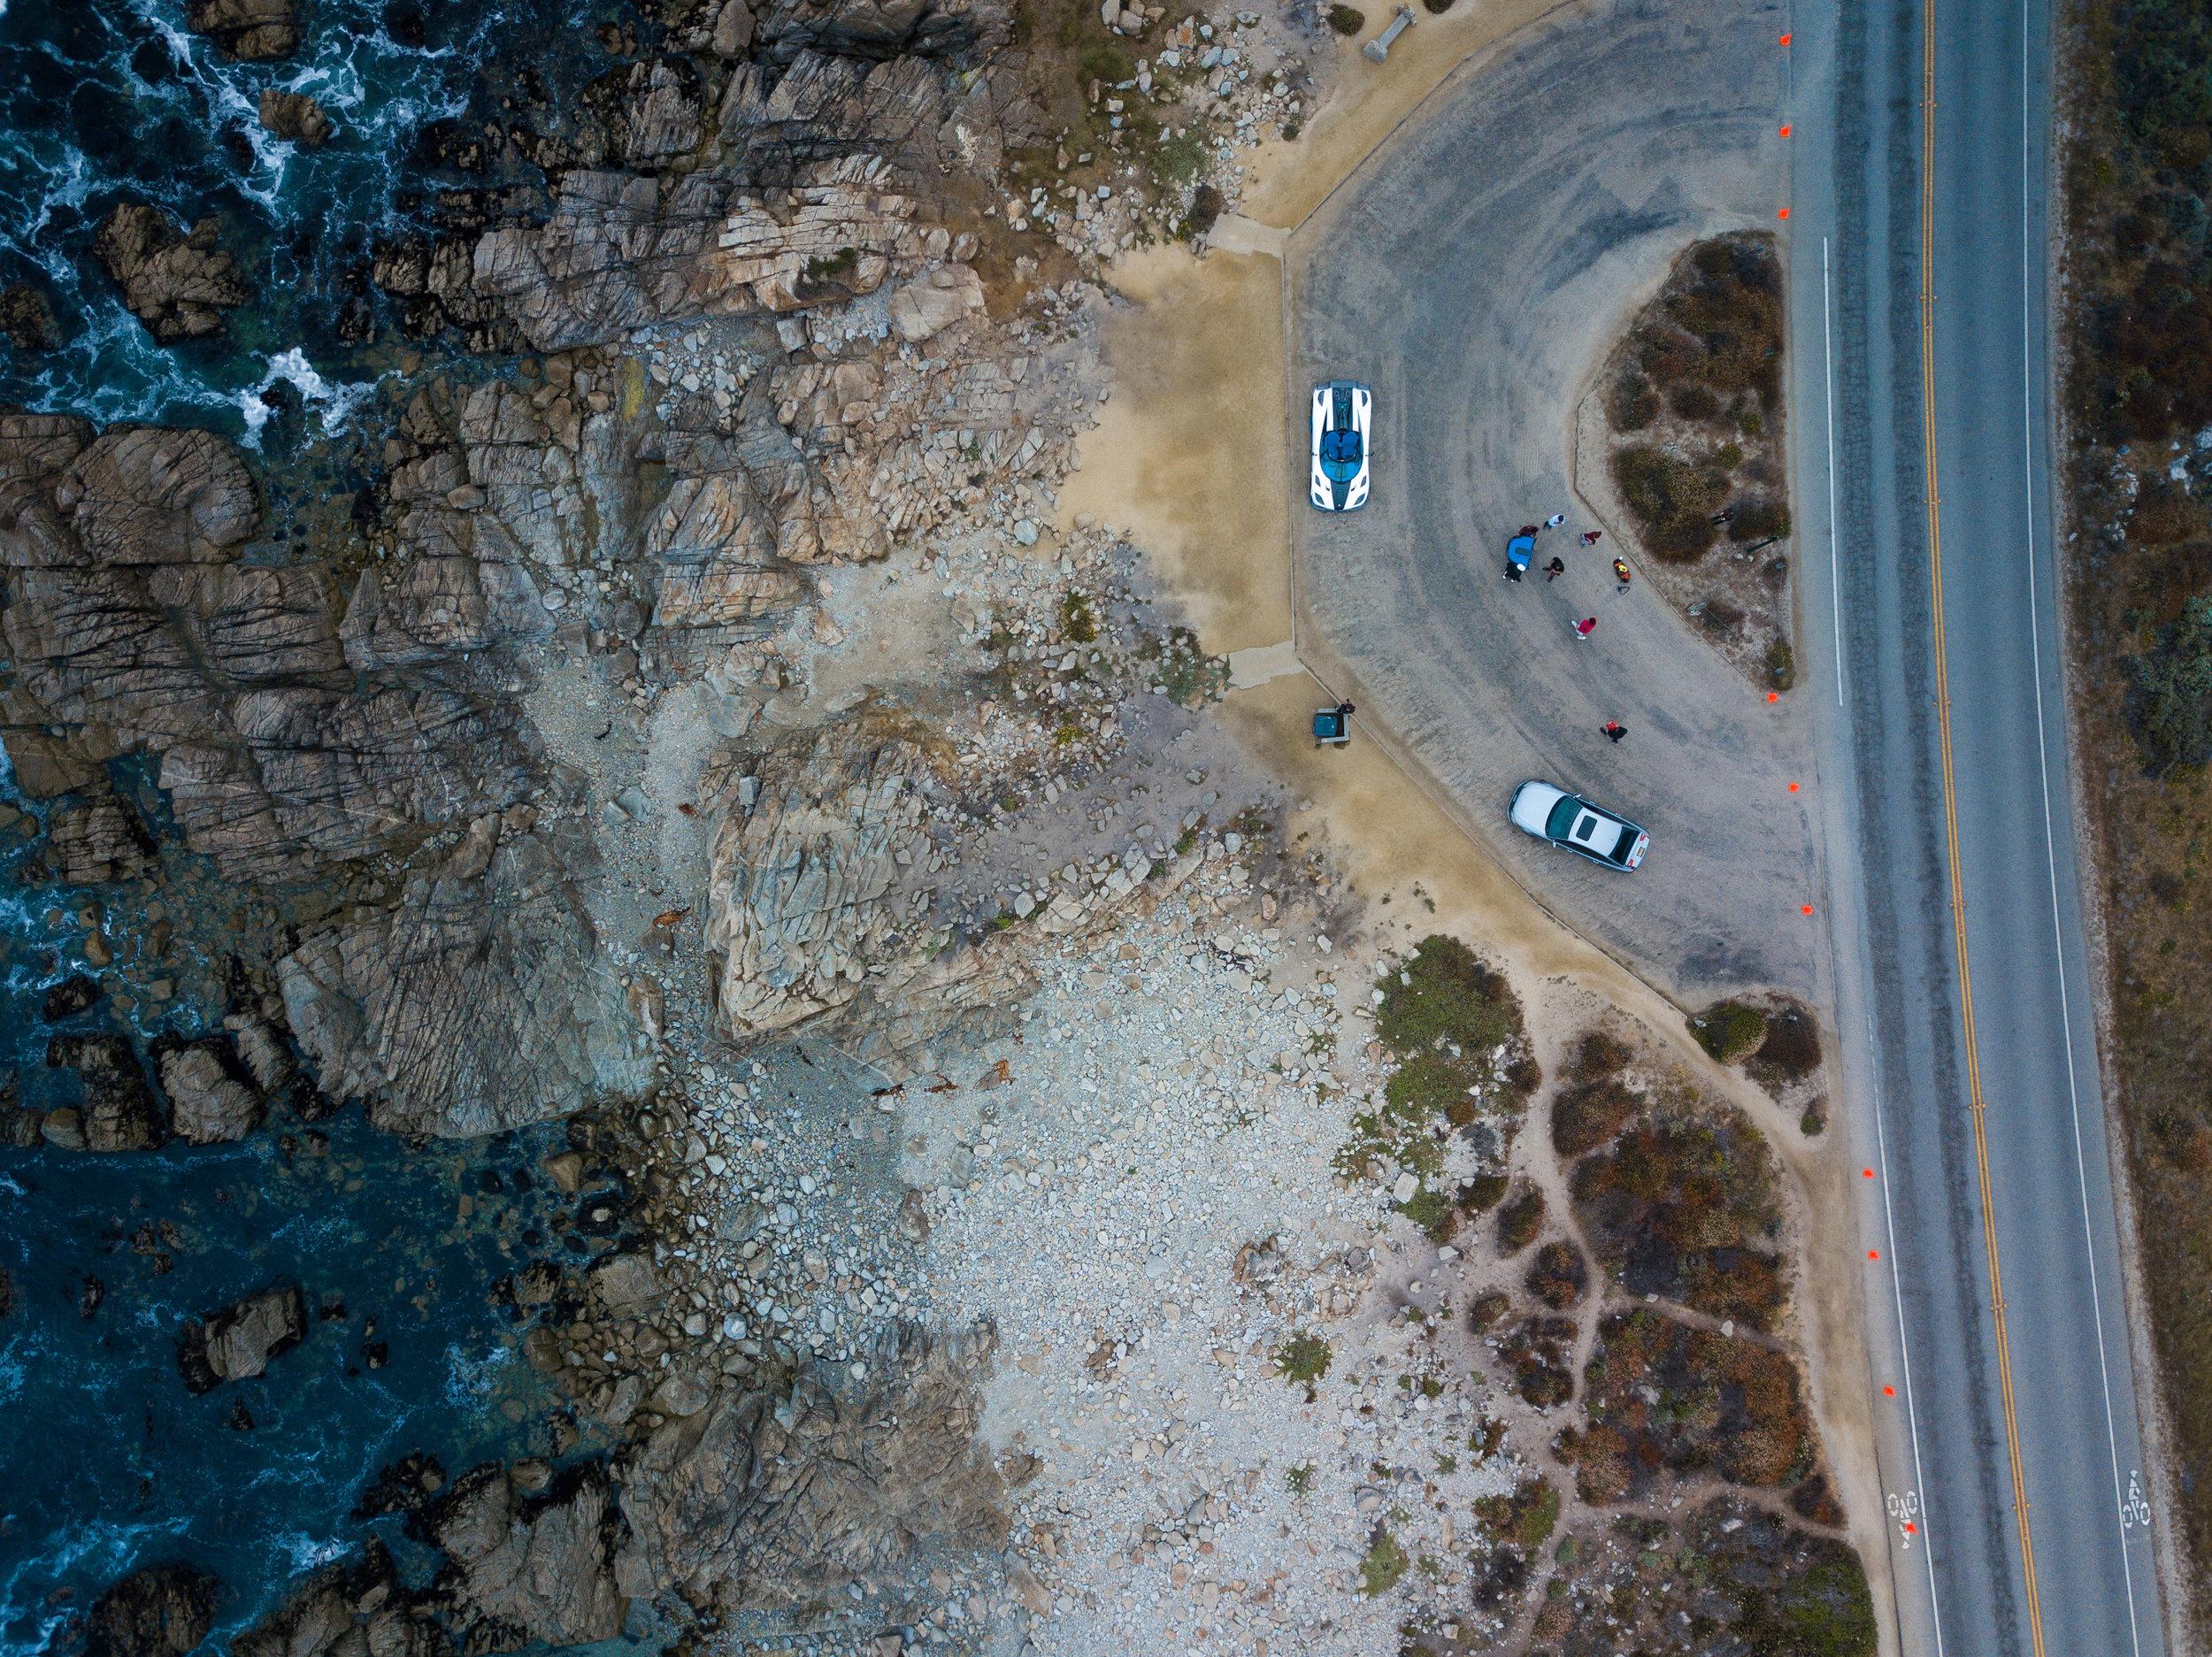 Stay_Driven_Monterey_Car_Week_Koenigsegg_Drone-6.jpg